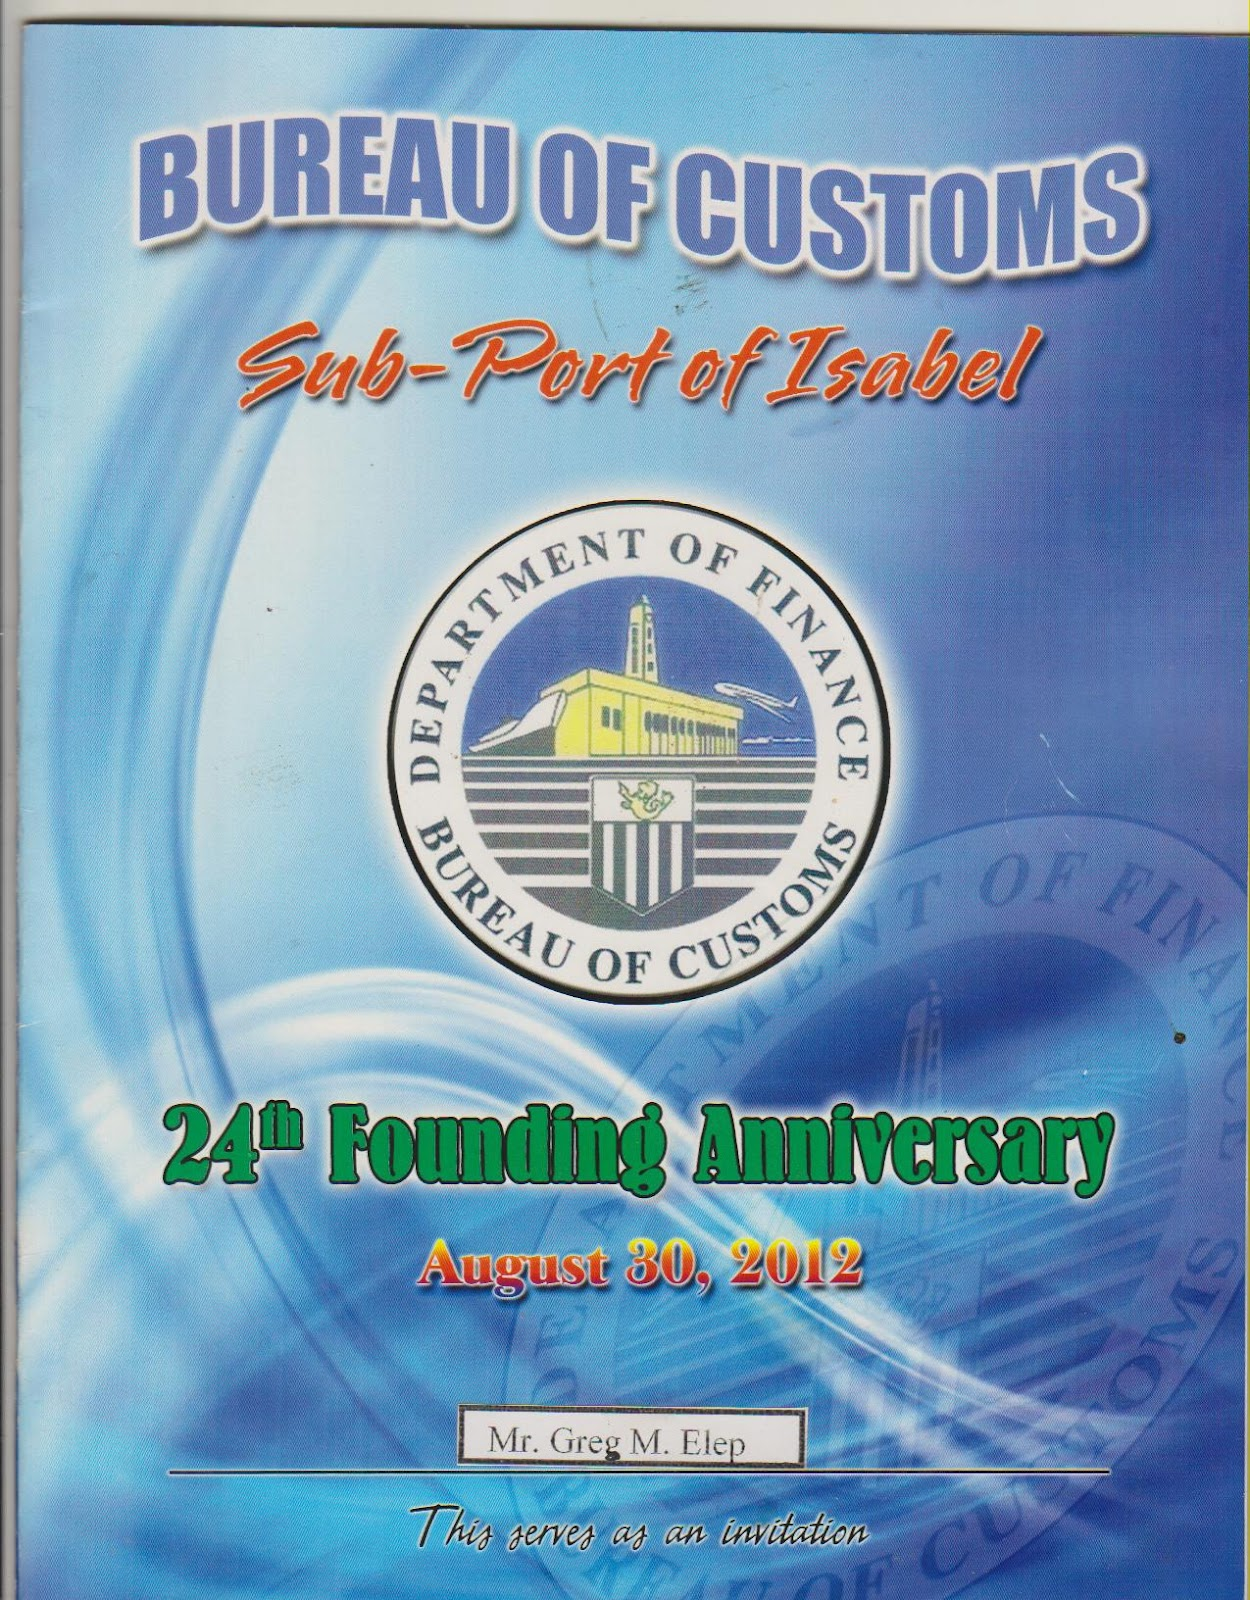 palomponwhatshappening: 24th Founding Anniversary BOC Isabel